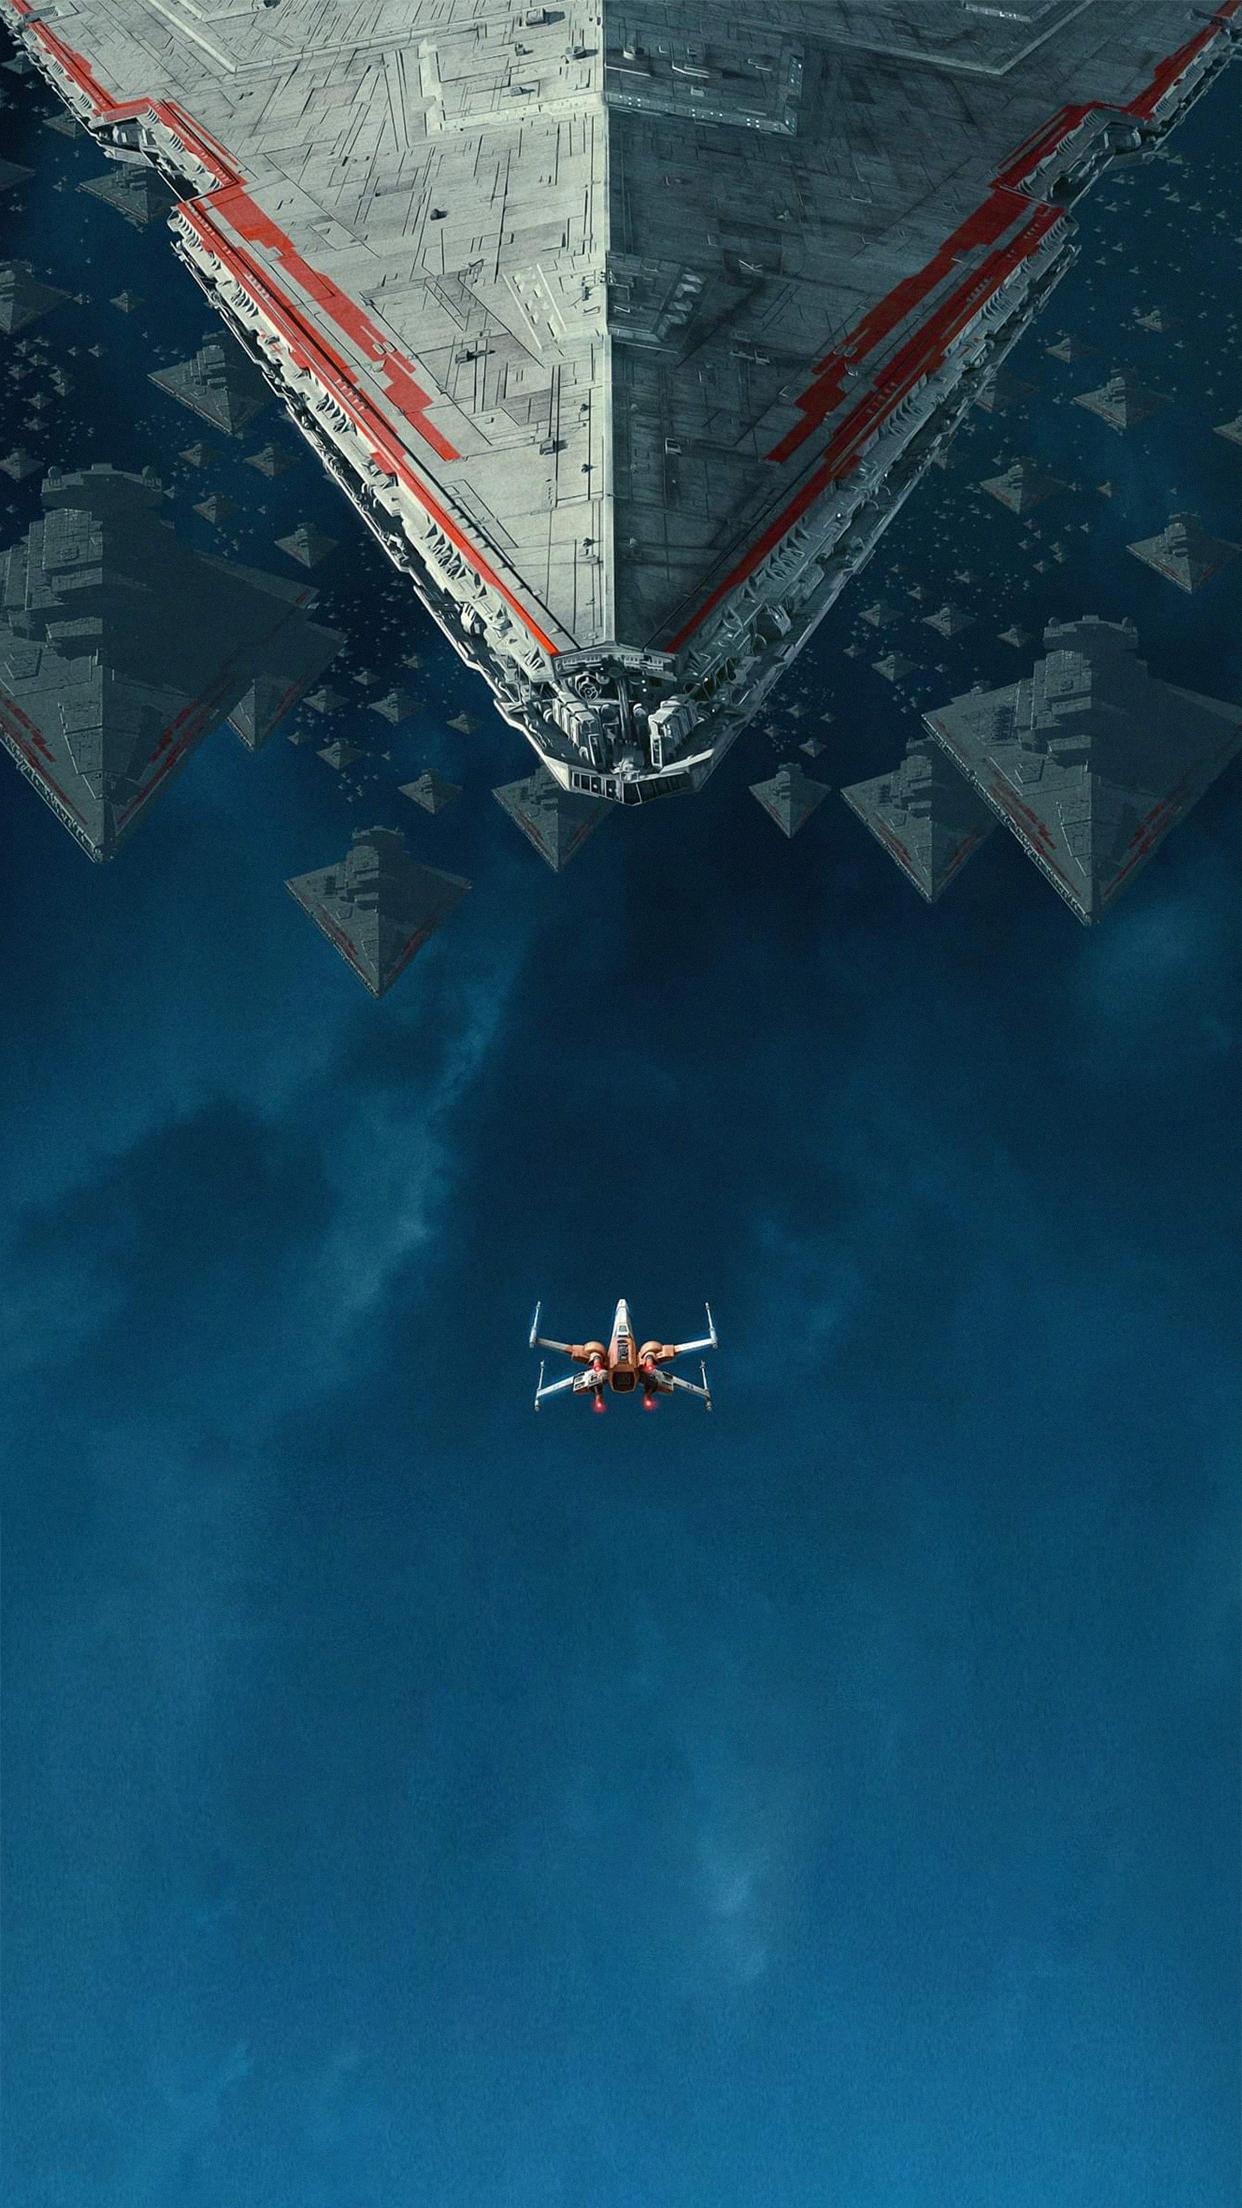 Star Wars Note 10 1242x2208 Wallpaper Teahub Io